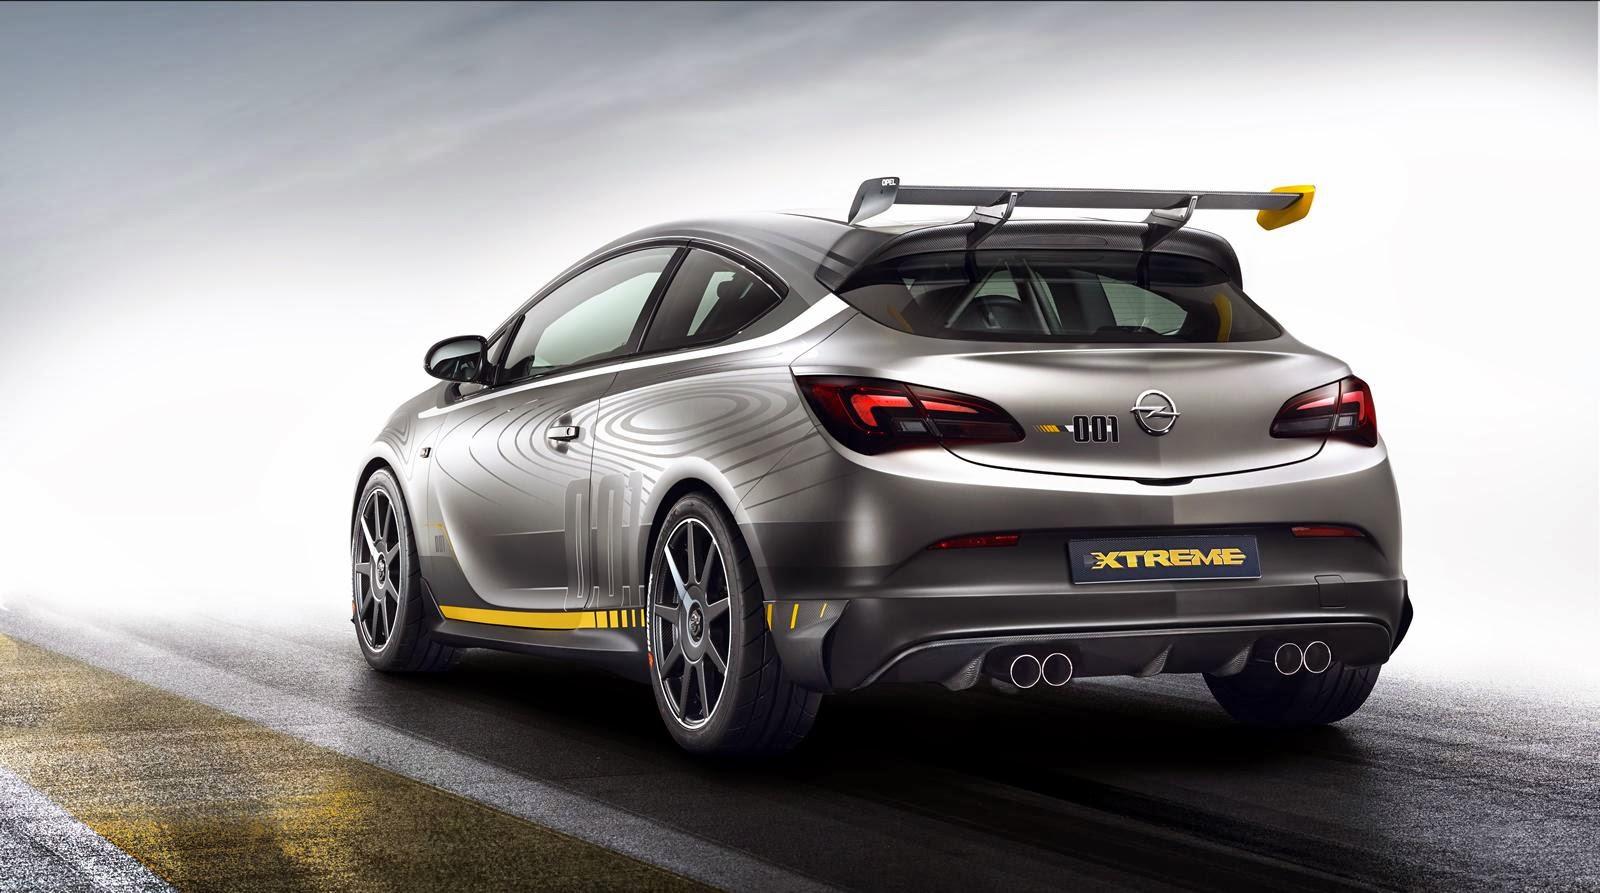 [Resim: Opel+Astra+OPC+EXTREME+2.jpg]